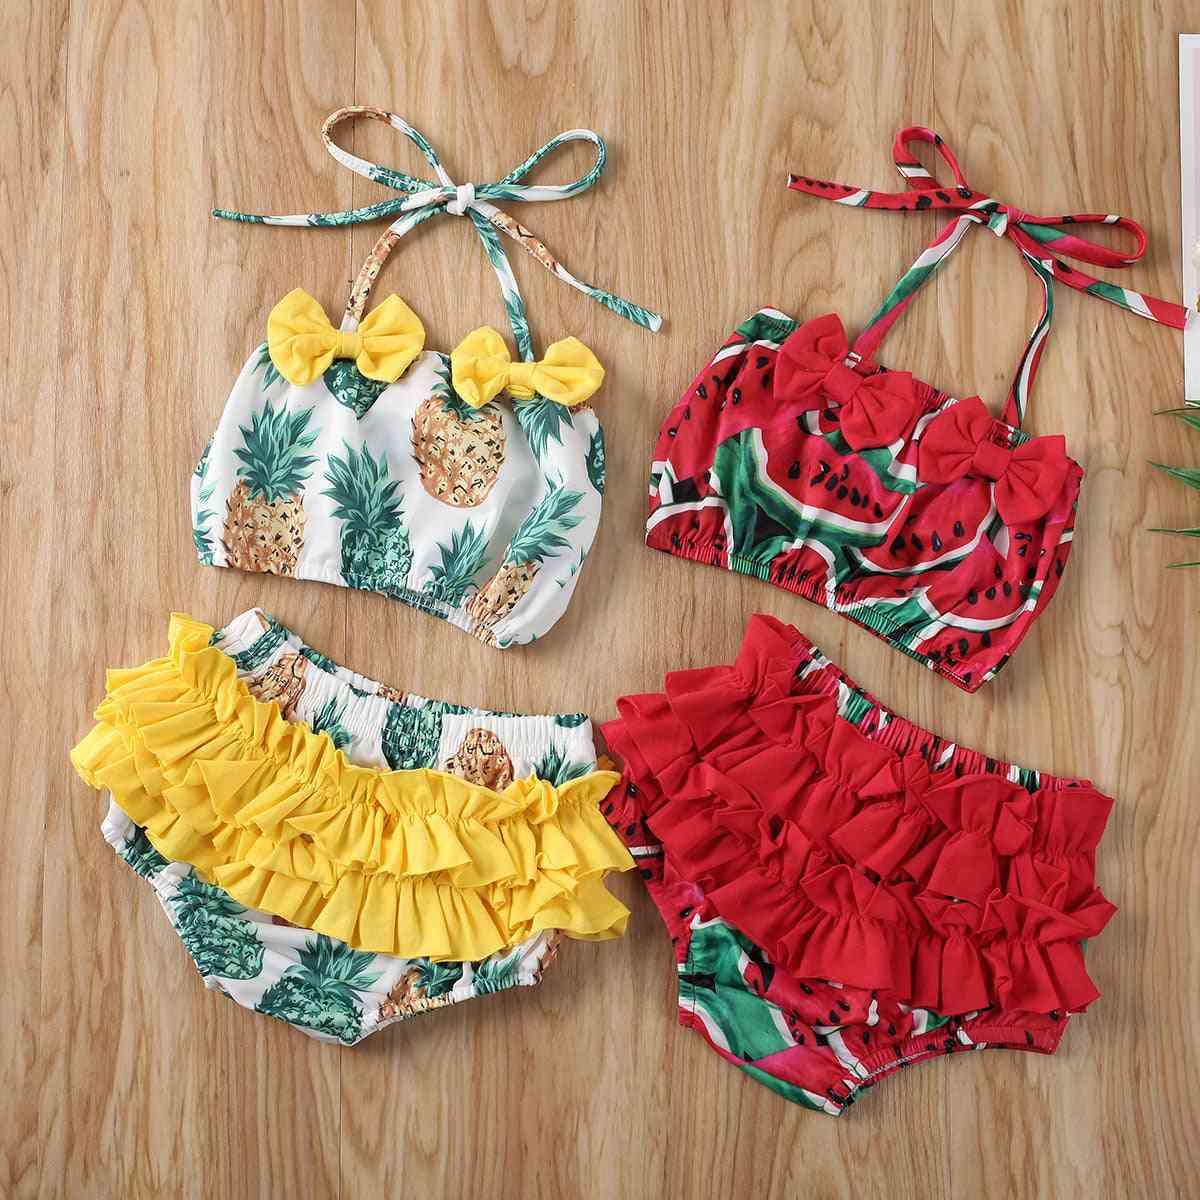 Baby Girl Summer Pineapple & Watermelon Print Swimwear Bikini Set, Ruffle Bowknot Swimsuit